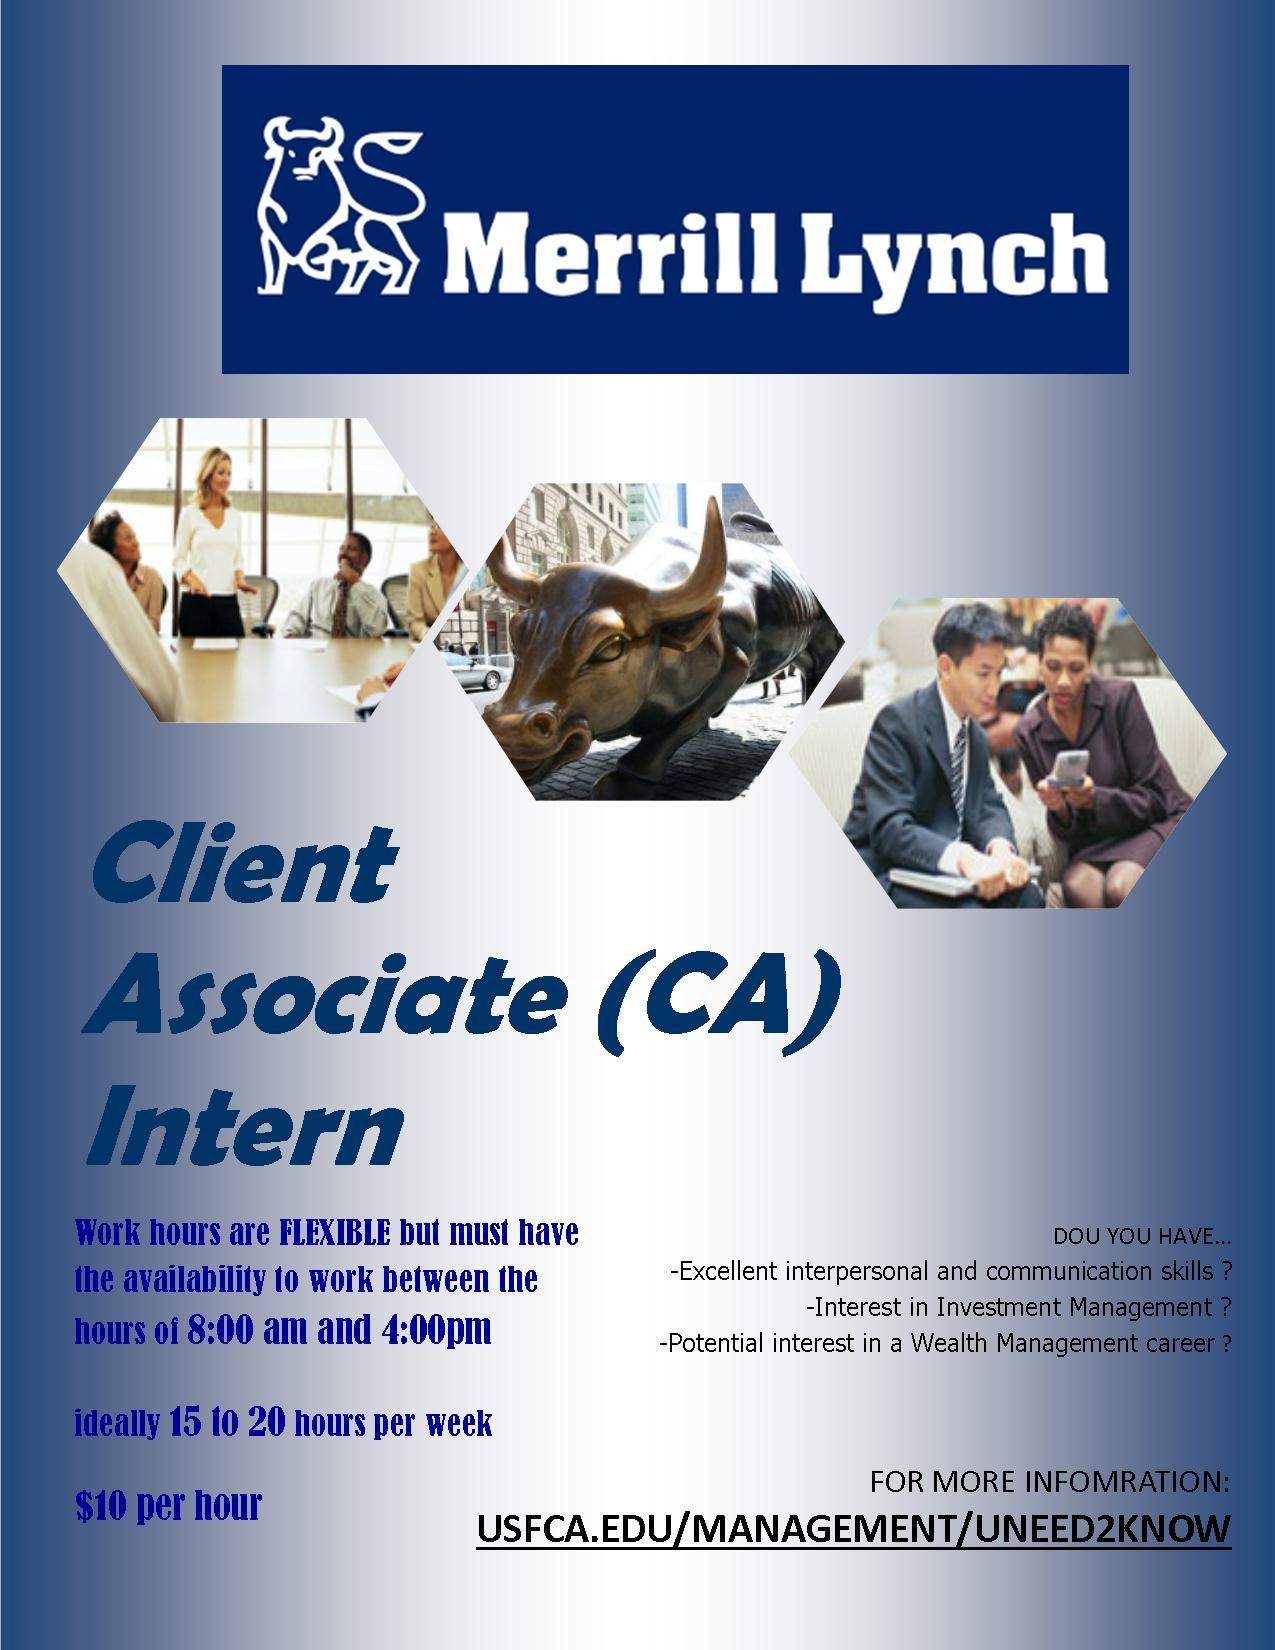 resume merrill lynch financial merrill lynch financial advisor merrill lynch client associate ca intern